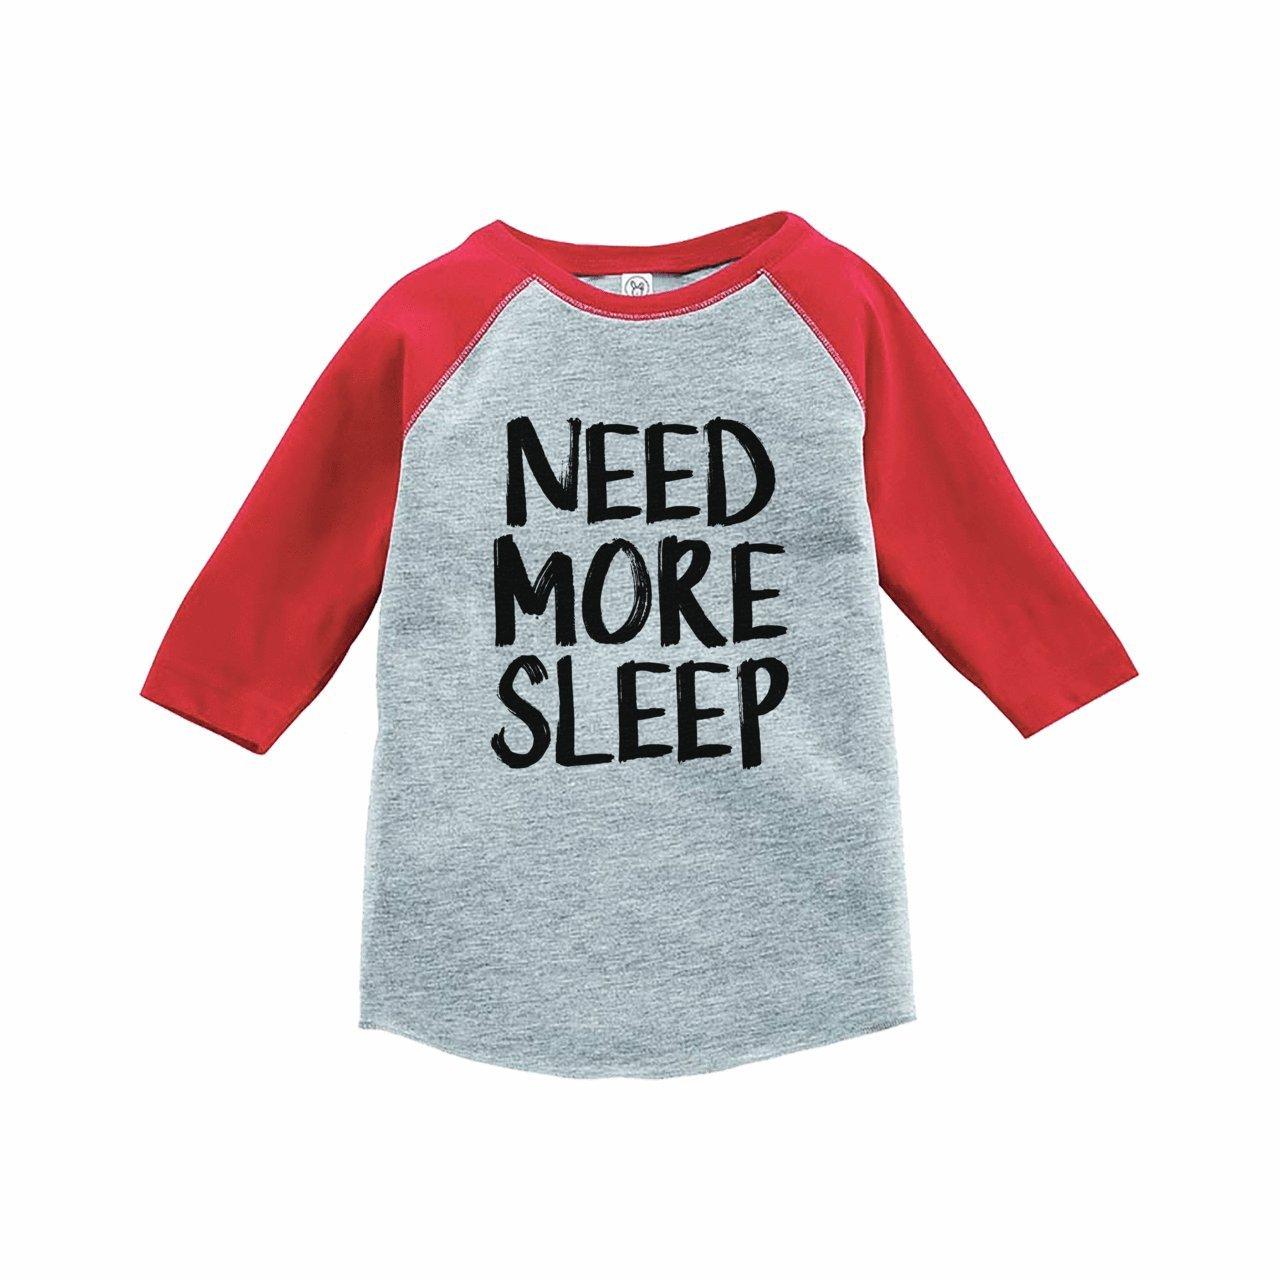 7 ate 9 Apparel Funny Kids Need More Sleep Baseball Tee Red